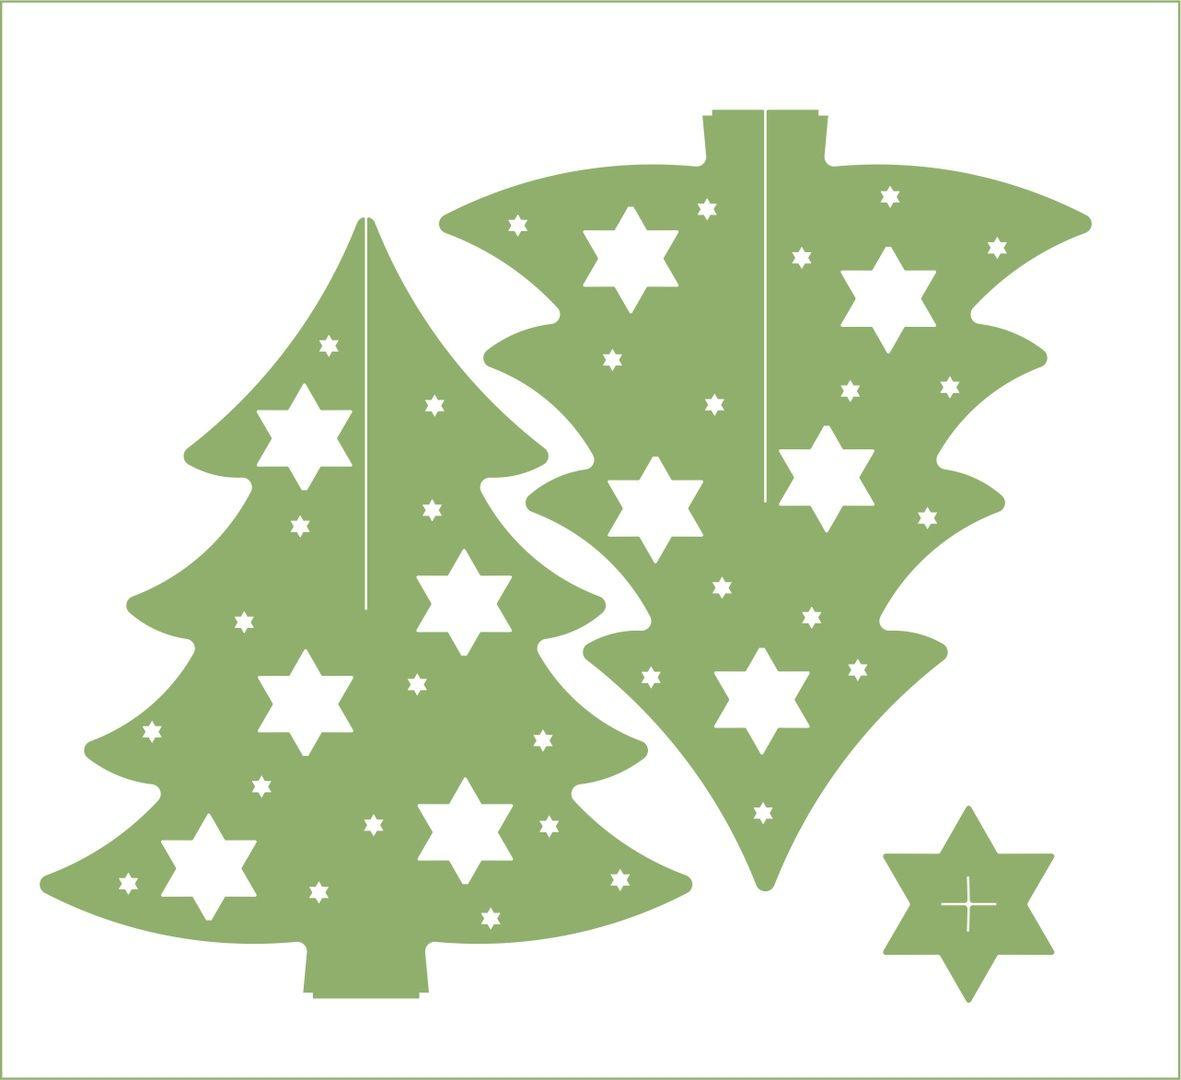 Amazing Christmas Tree Vector Free Download Cdr File Tree Free Amazing Christmas Trees Vector Free